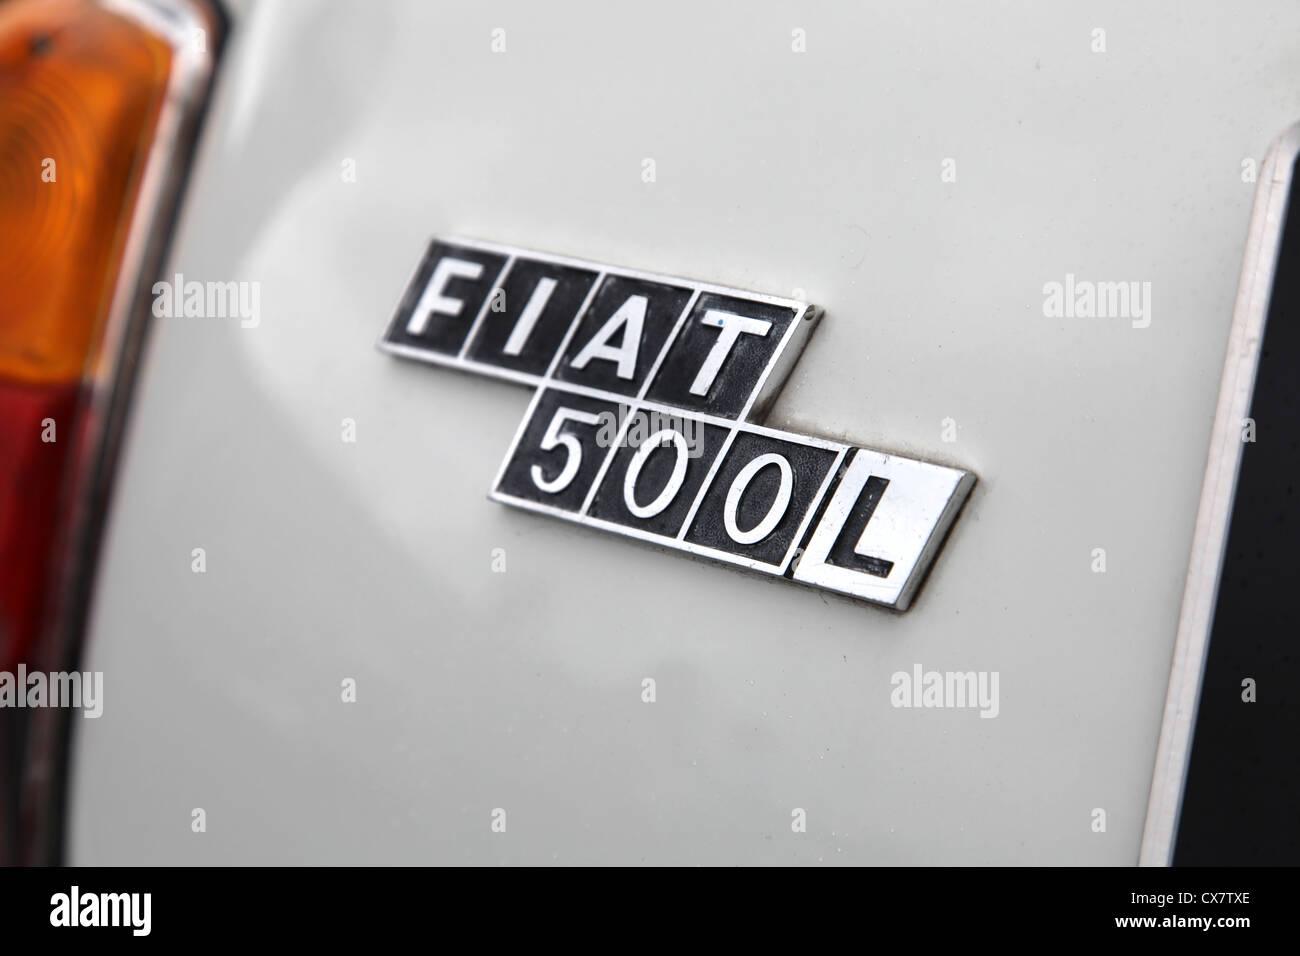 Car Fiat Symbol Mark Stock Photos Car Fiat Symbol Mark Stock